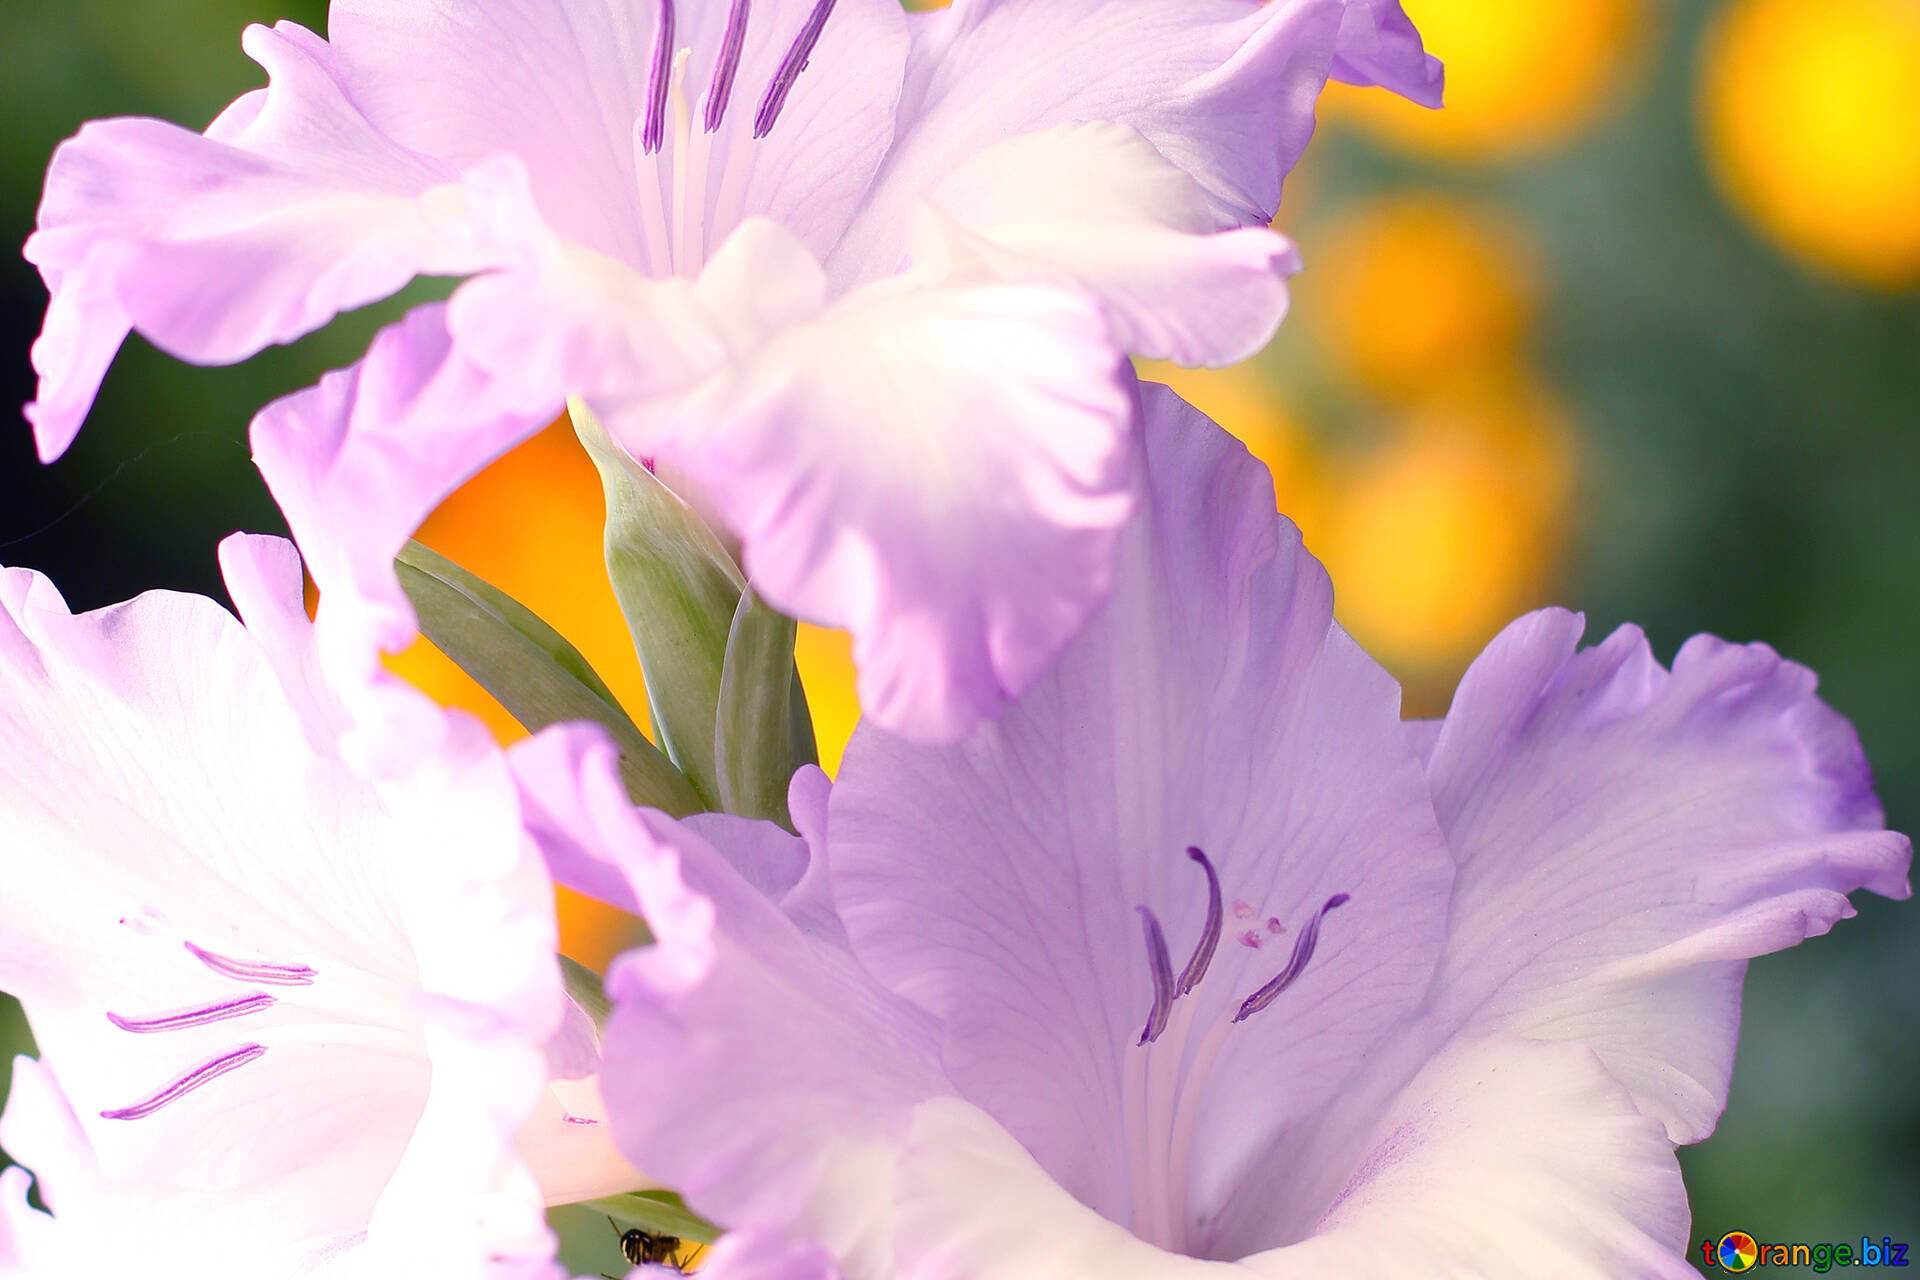 Background for congratulations beautiful flowers for congratulations download free image beautiful flowers for congratulations in hd wallpaper size 1920px izmirmasajfo